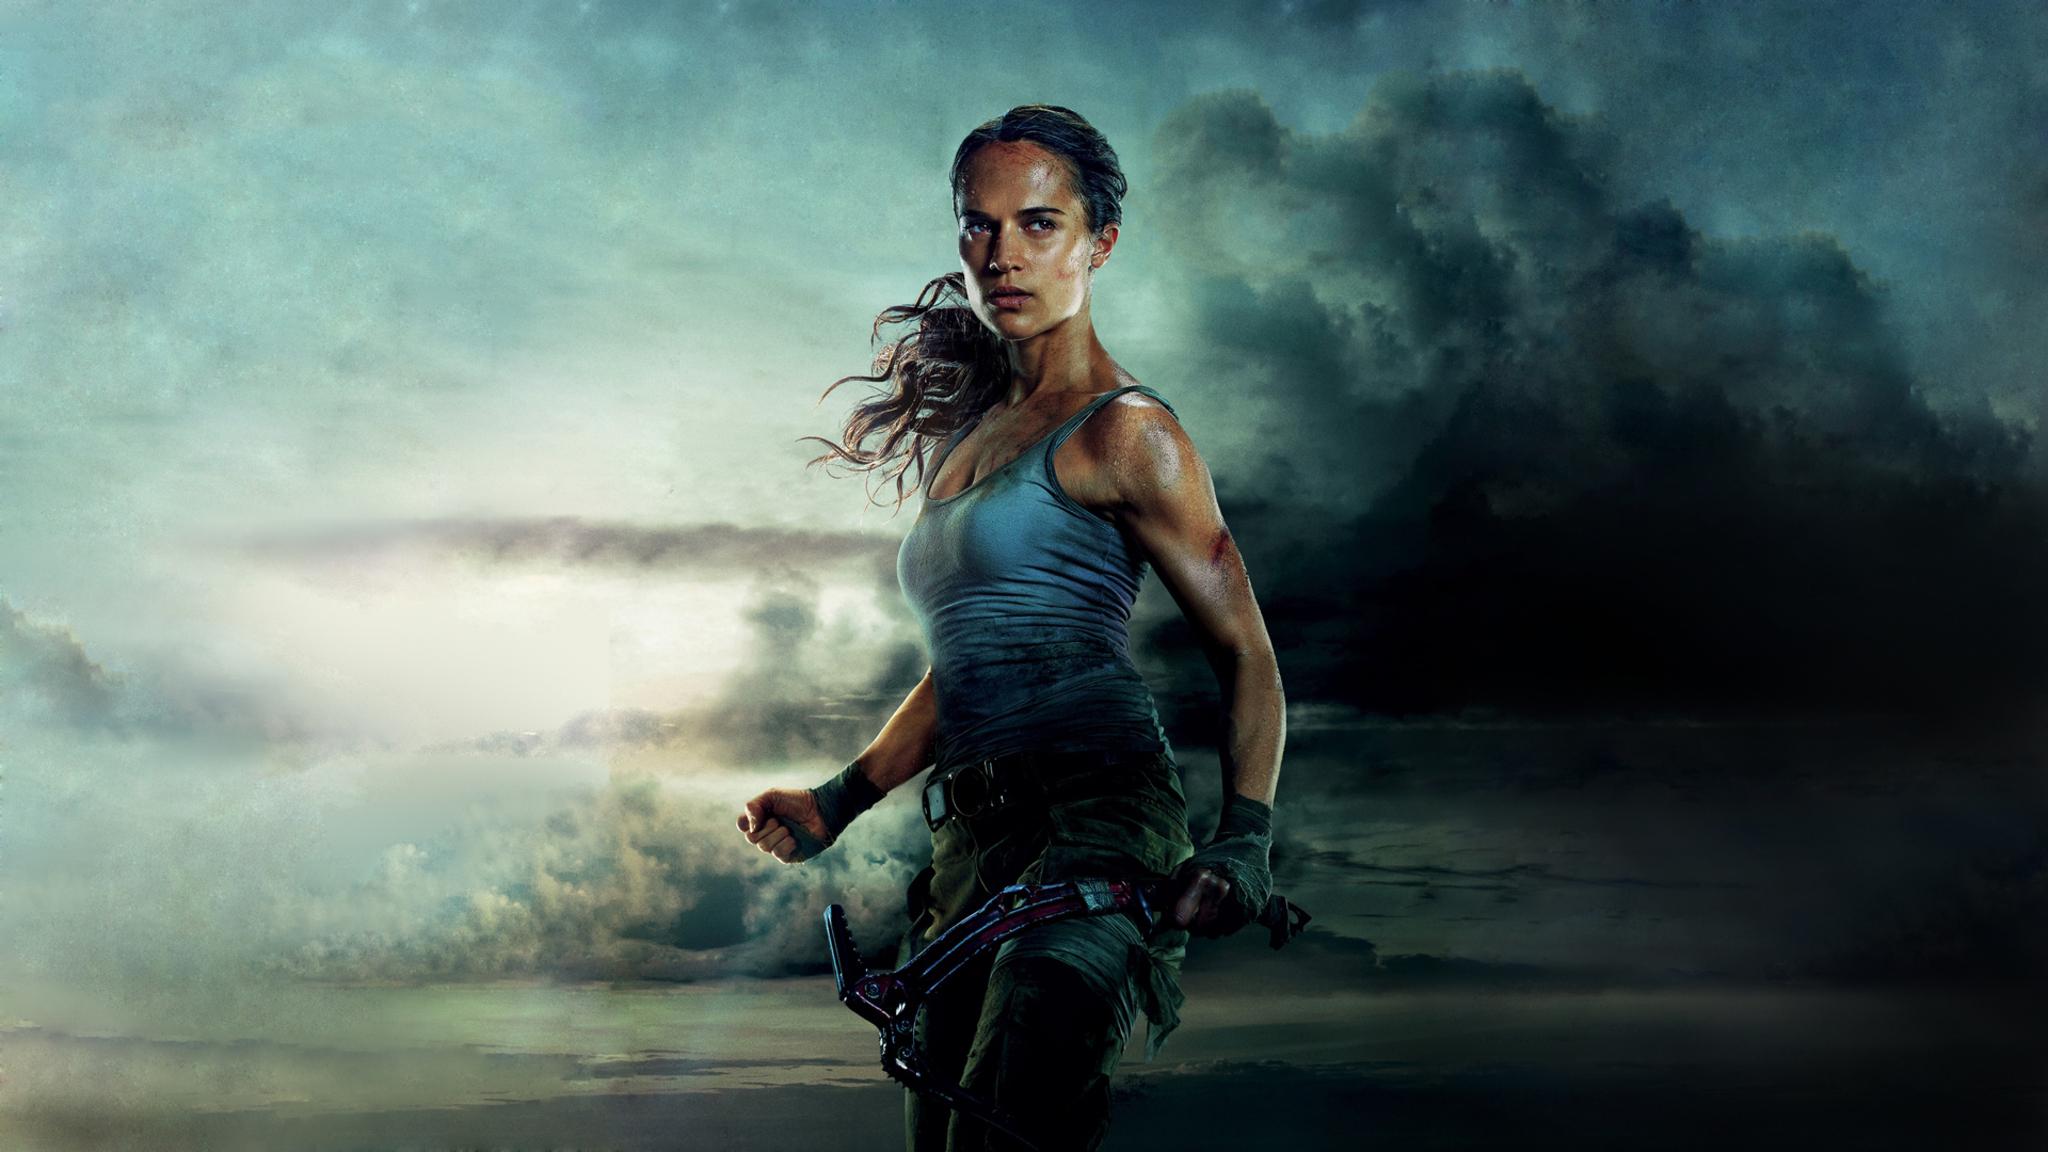 2048x1152 Tomb Raider 2018 Movie Alicia Vikander 2048x1152 ...